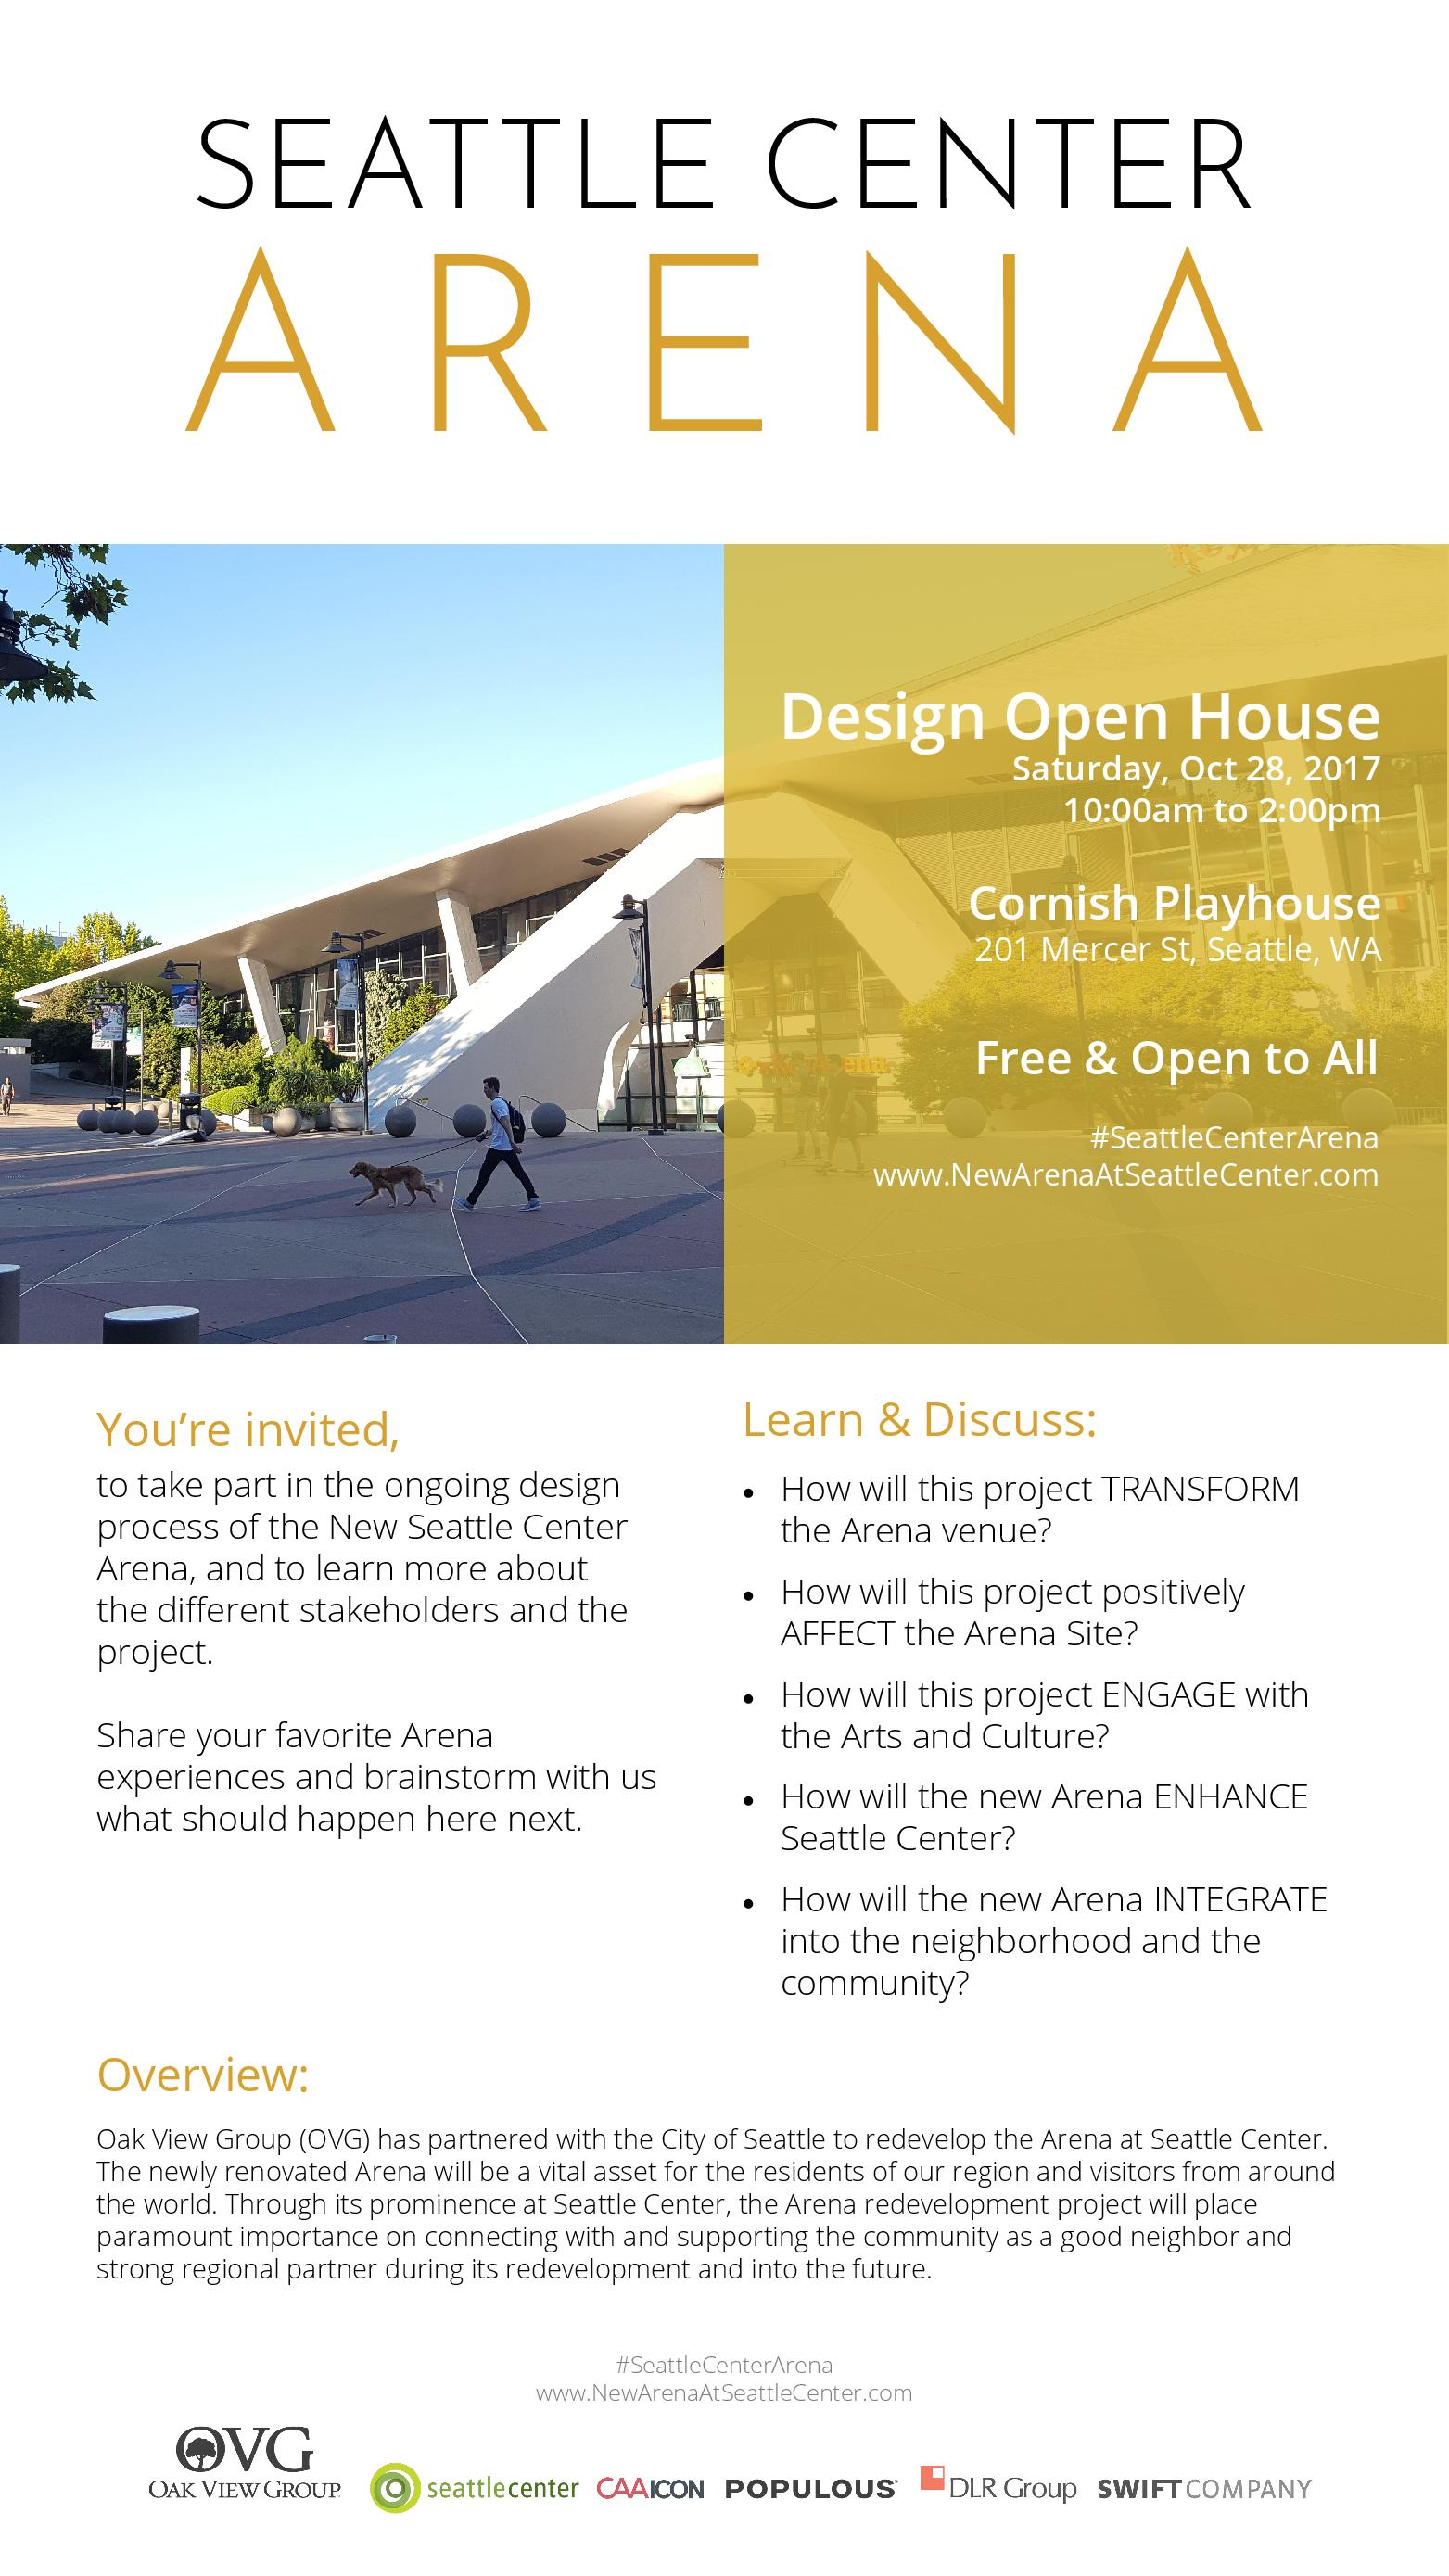 Seattle Center Arena: Design Open House